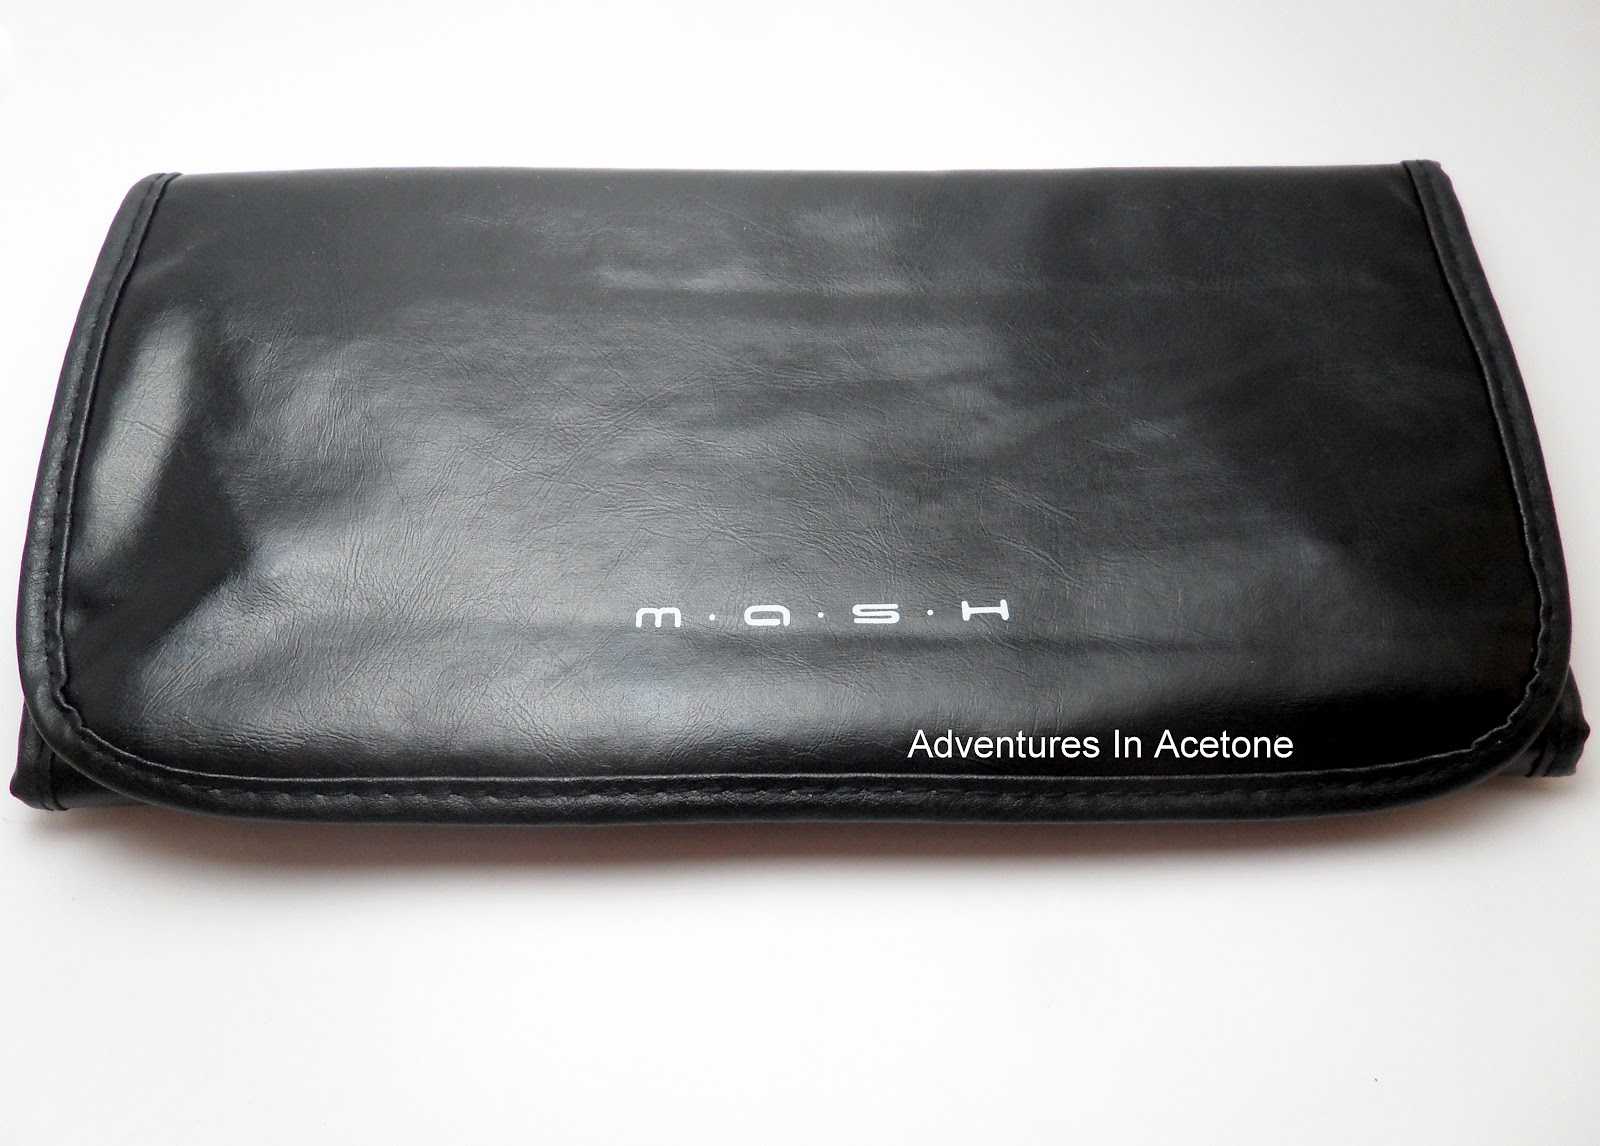 Mash Nail Art Brush Set Review Adventures In Acetone